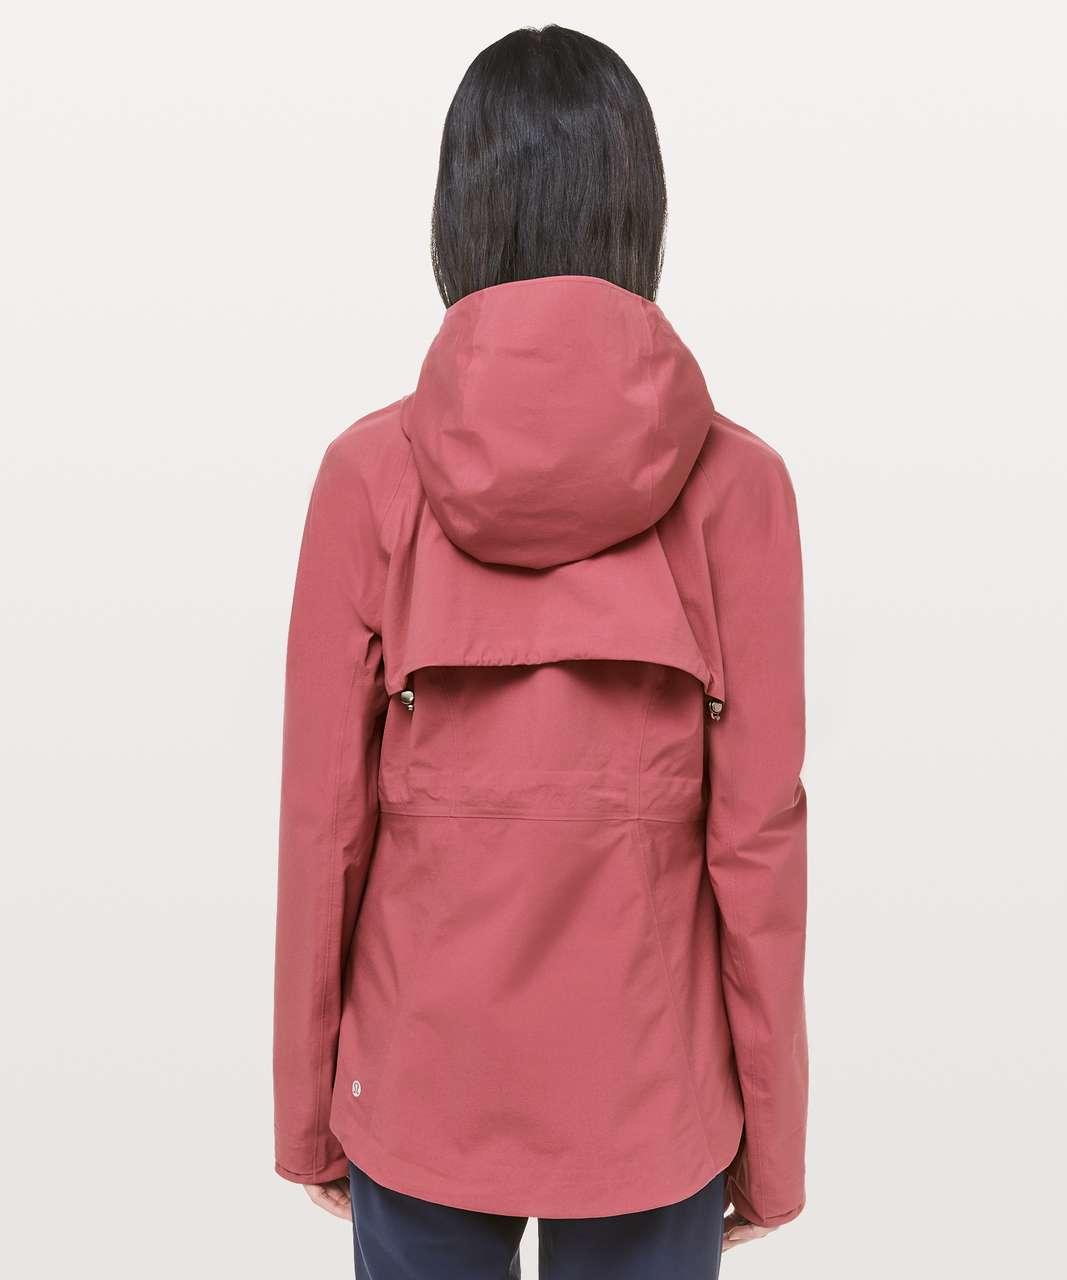 Lululemon The Rain Is Calling Jacket II - Misty Merlot